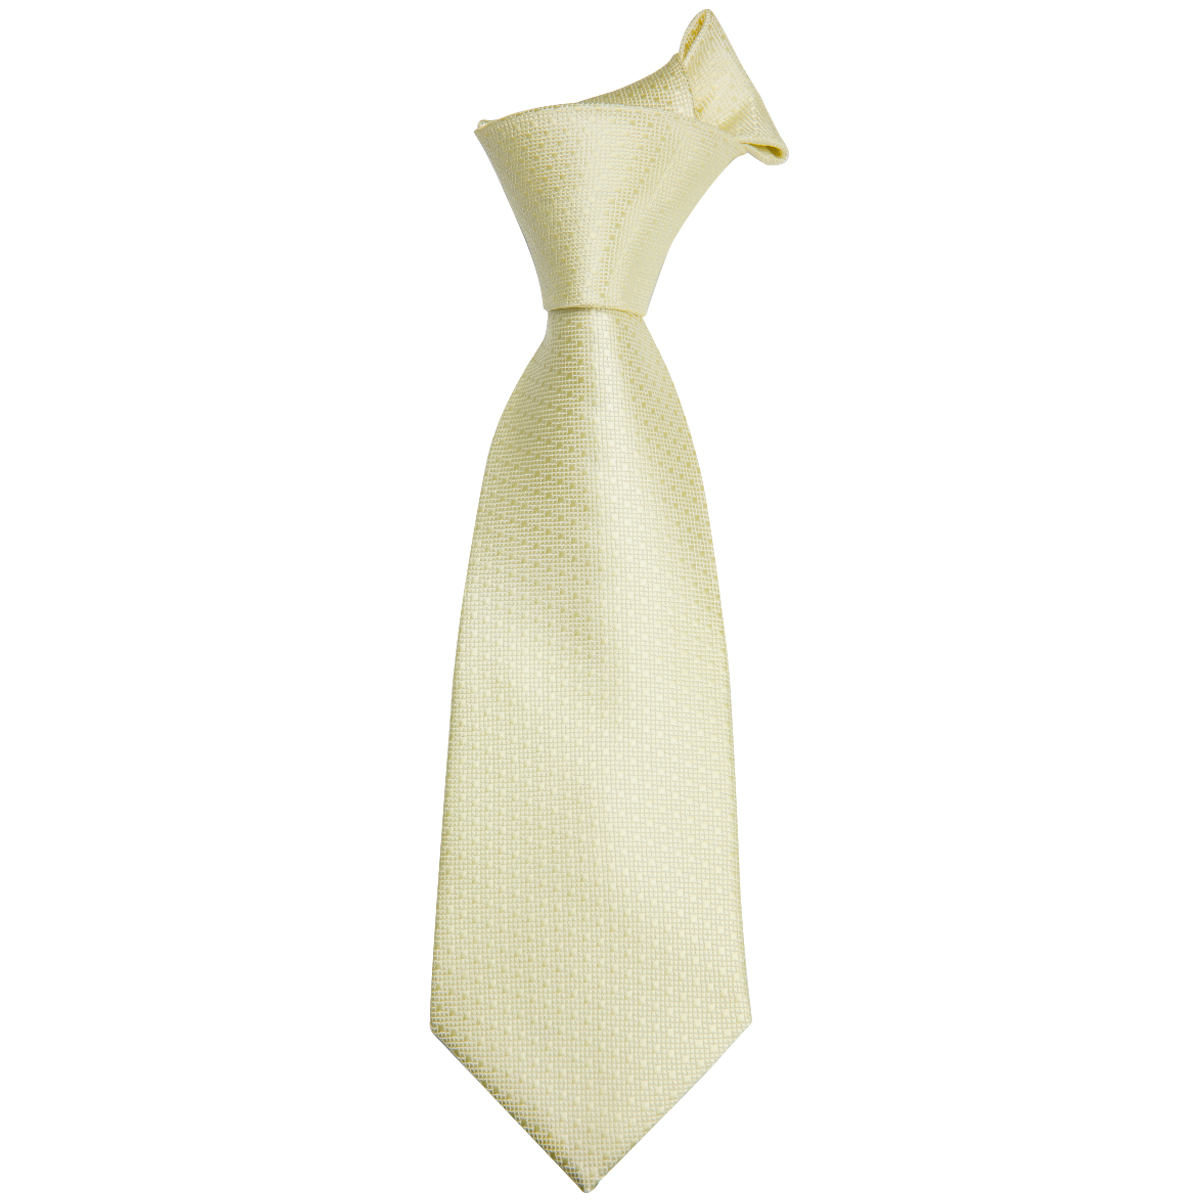 Hi-Tie Classic Bussiness Style Tie For Men Famous Brand Designer Solid Pattern Gravatas Necktie Hanky Cufflinks Set C-3033